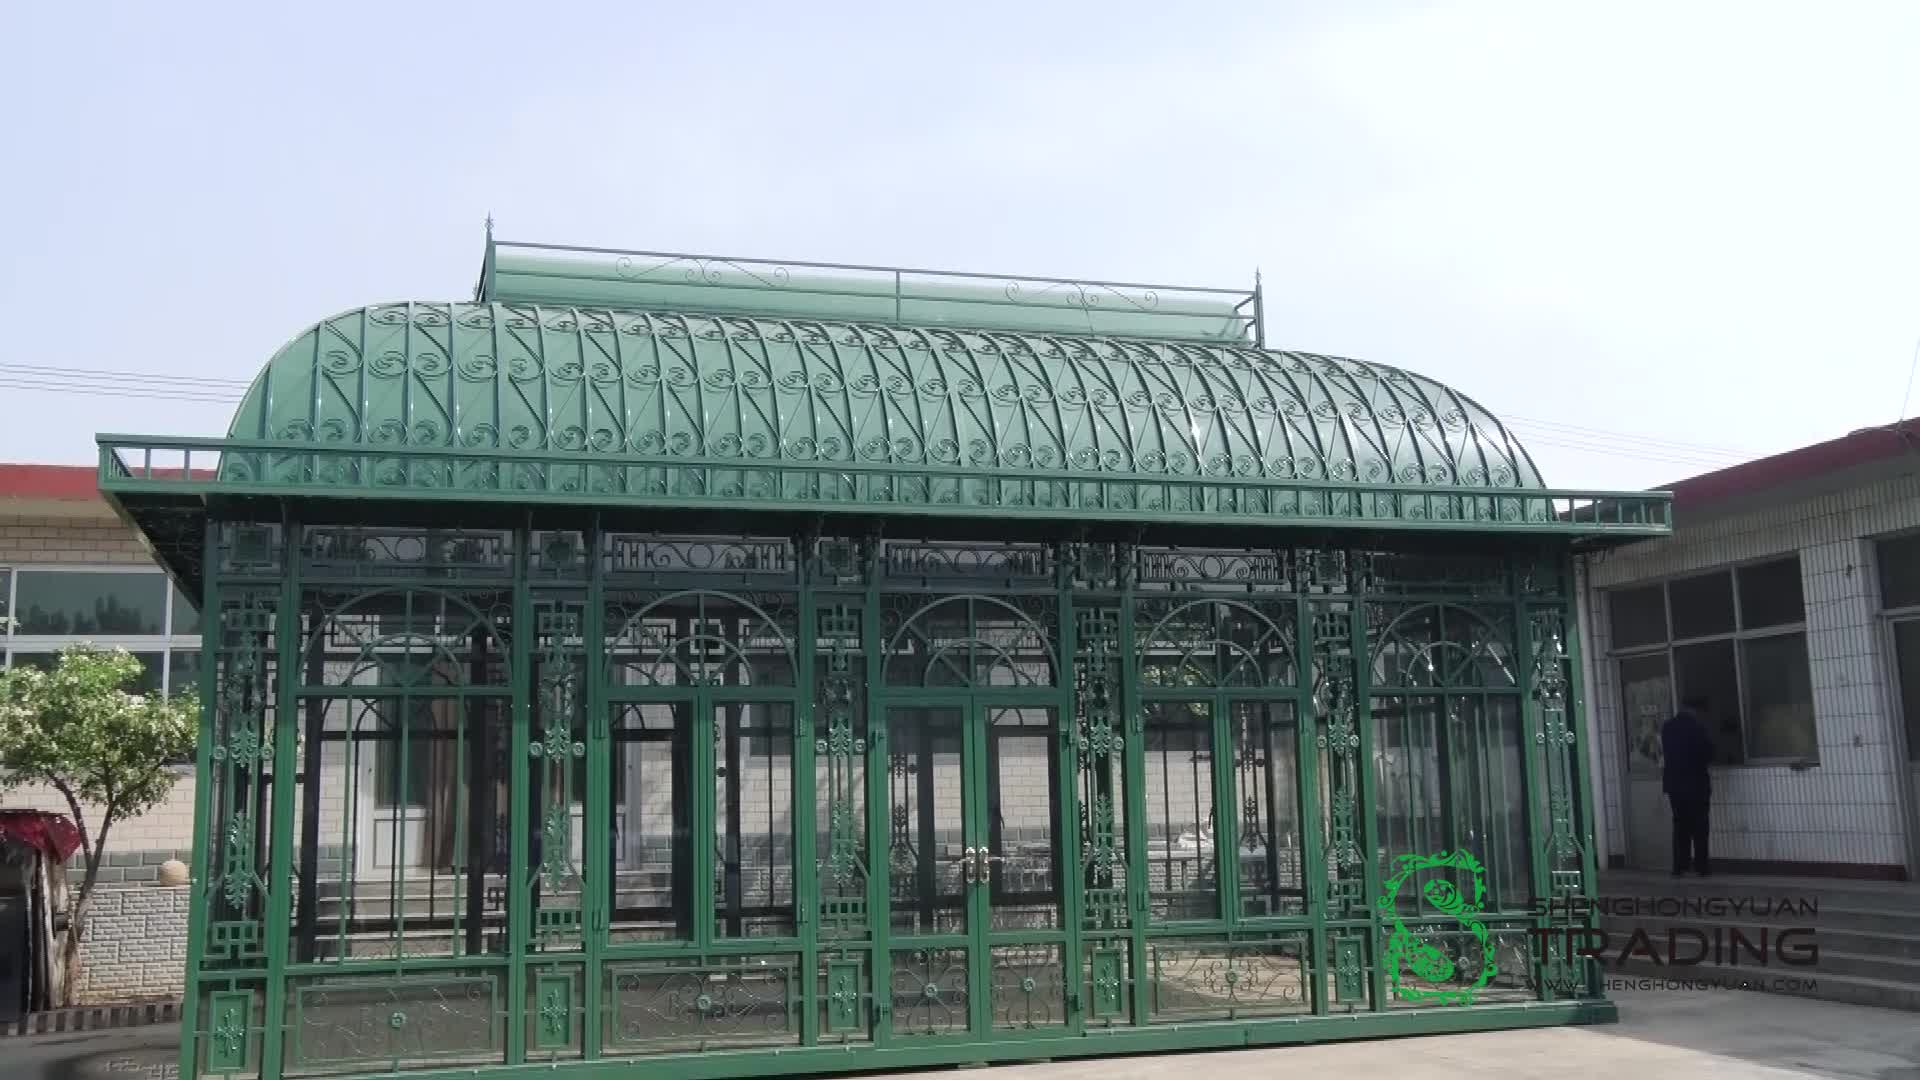 garden steel pavilion/cast iron green house, outdoor house decorative wrought iron gazebo for sale